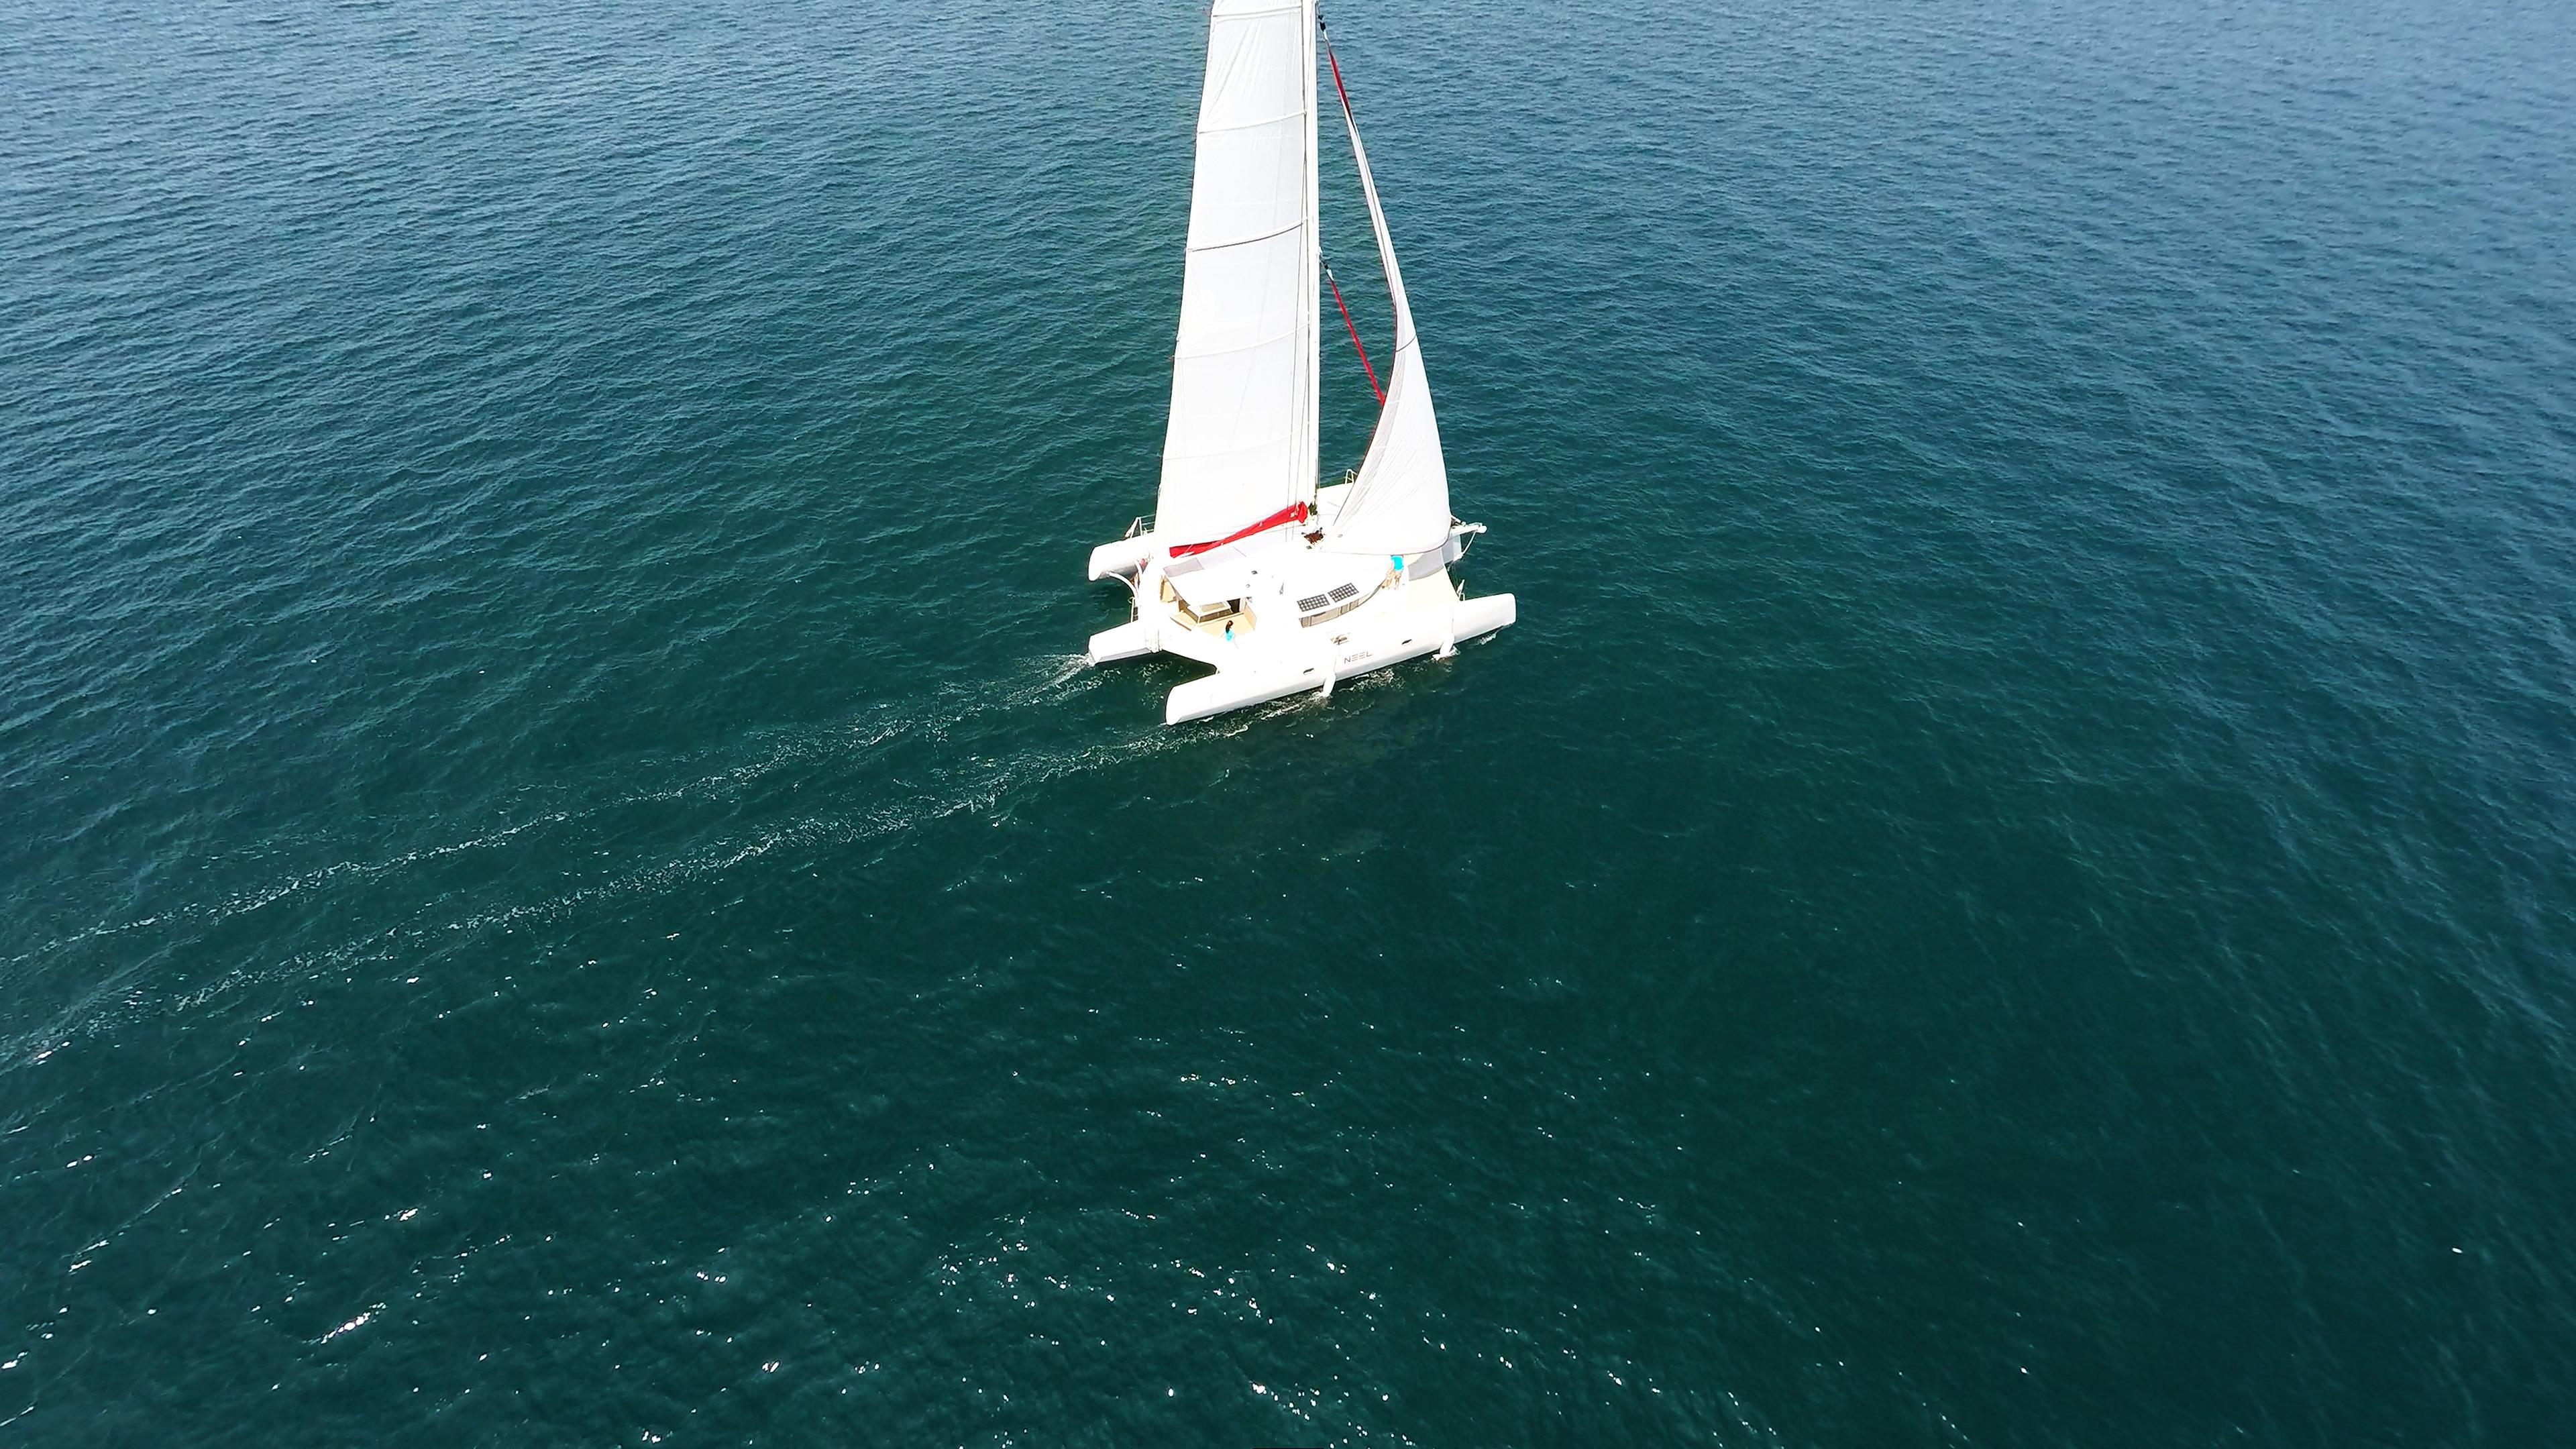 trimarano naviga a vela 3